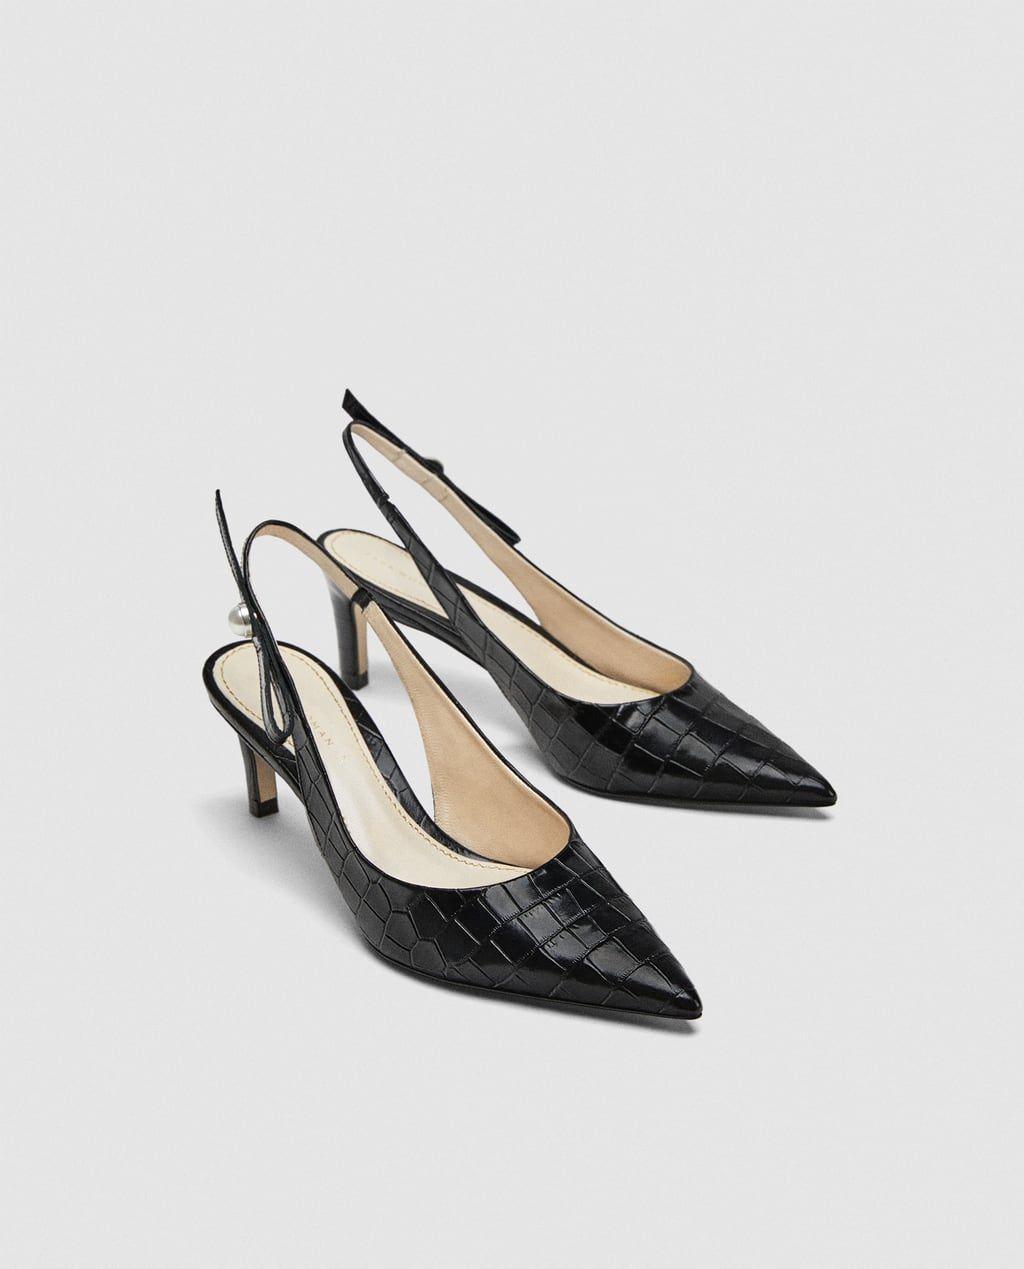 66ed4b21174 SLINGBACK LEATHER HIGH HEEL COURT SHOES-High-heels-SHOES-WOMAN ...